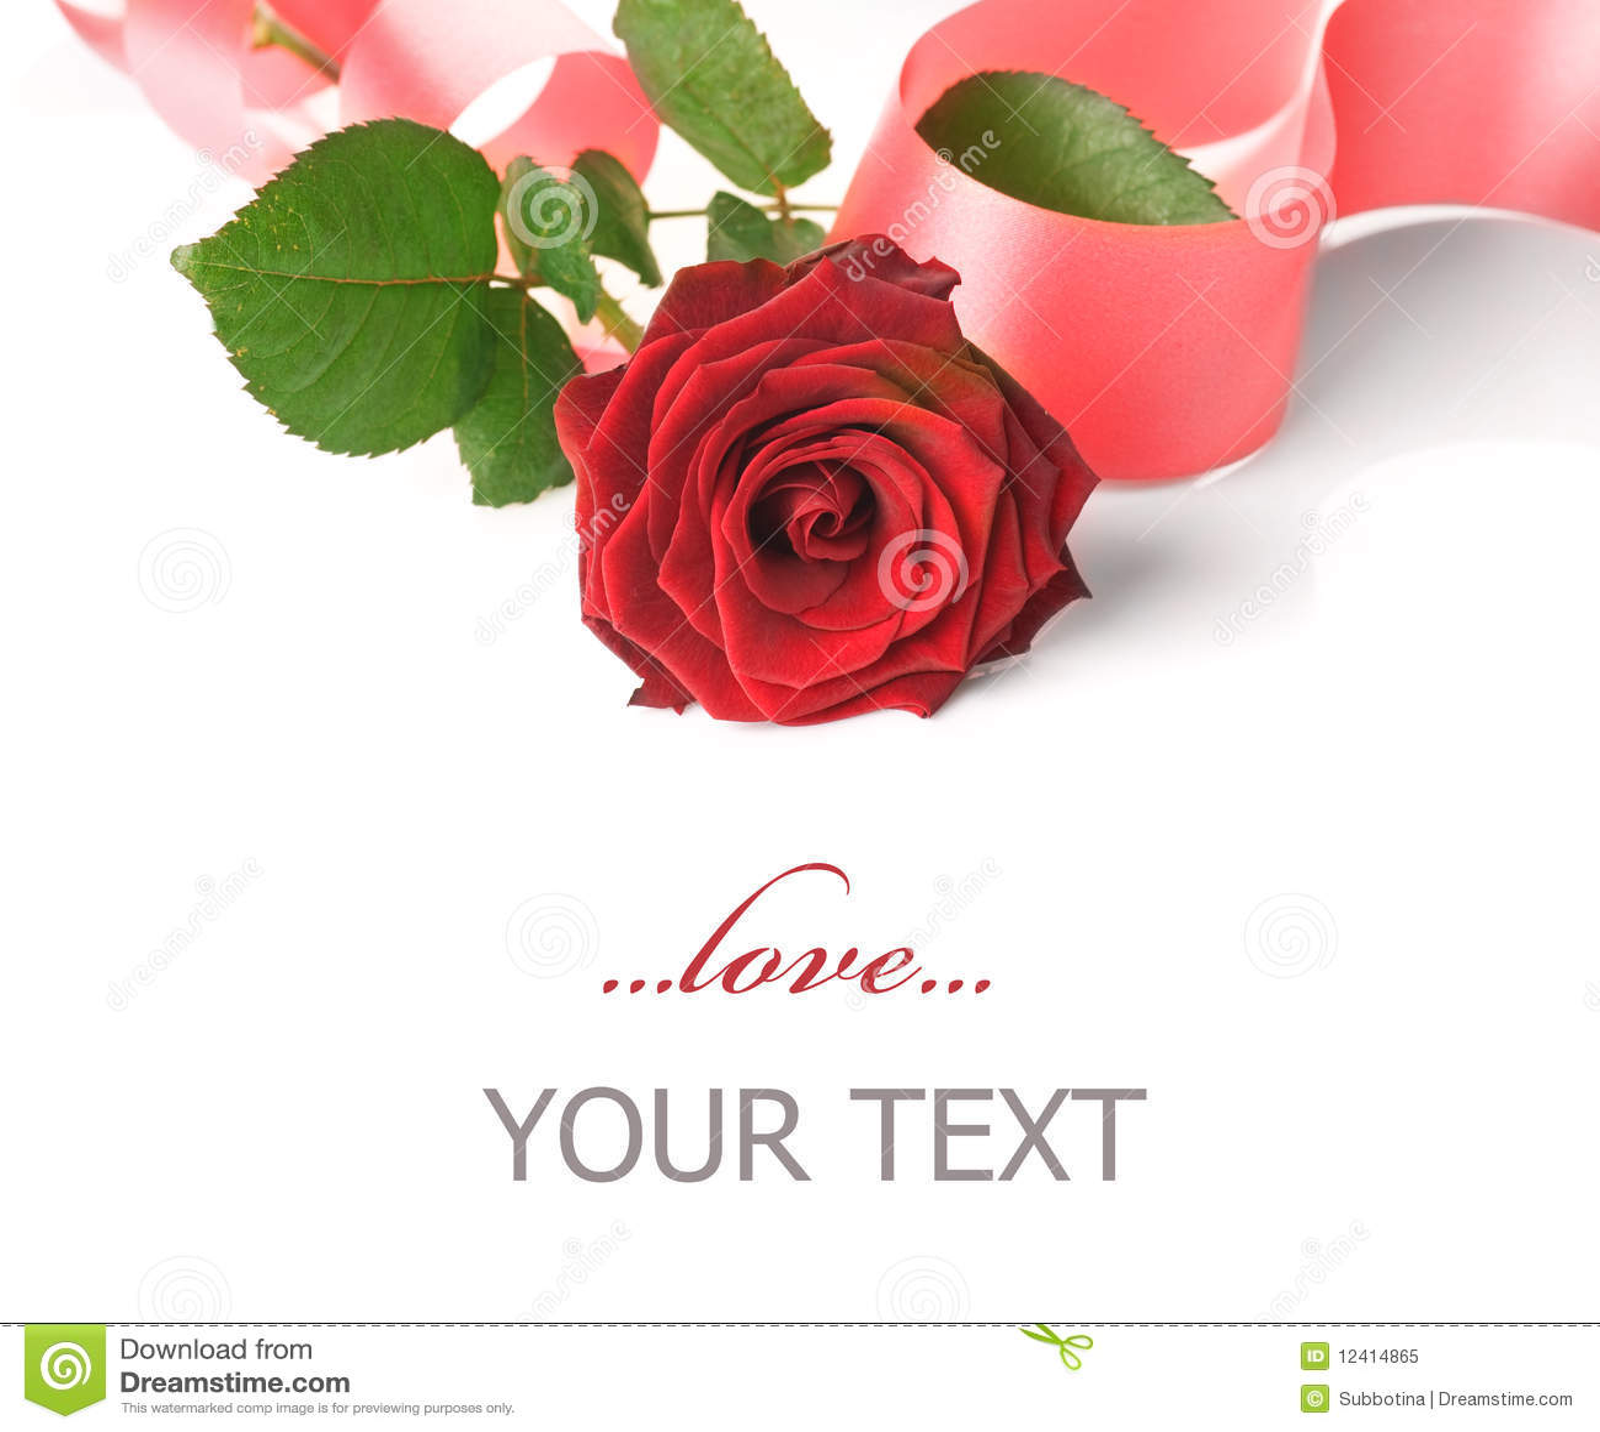 Rose.Love